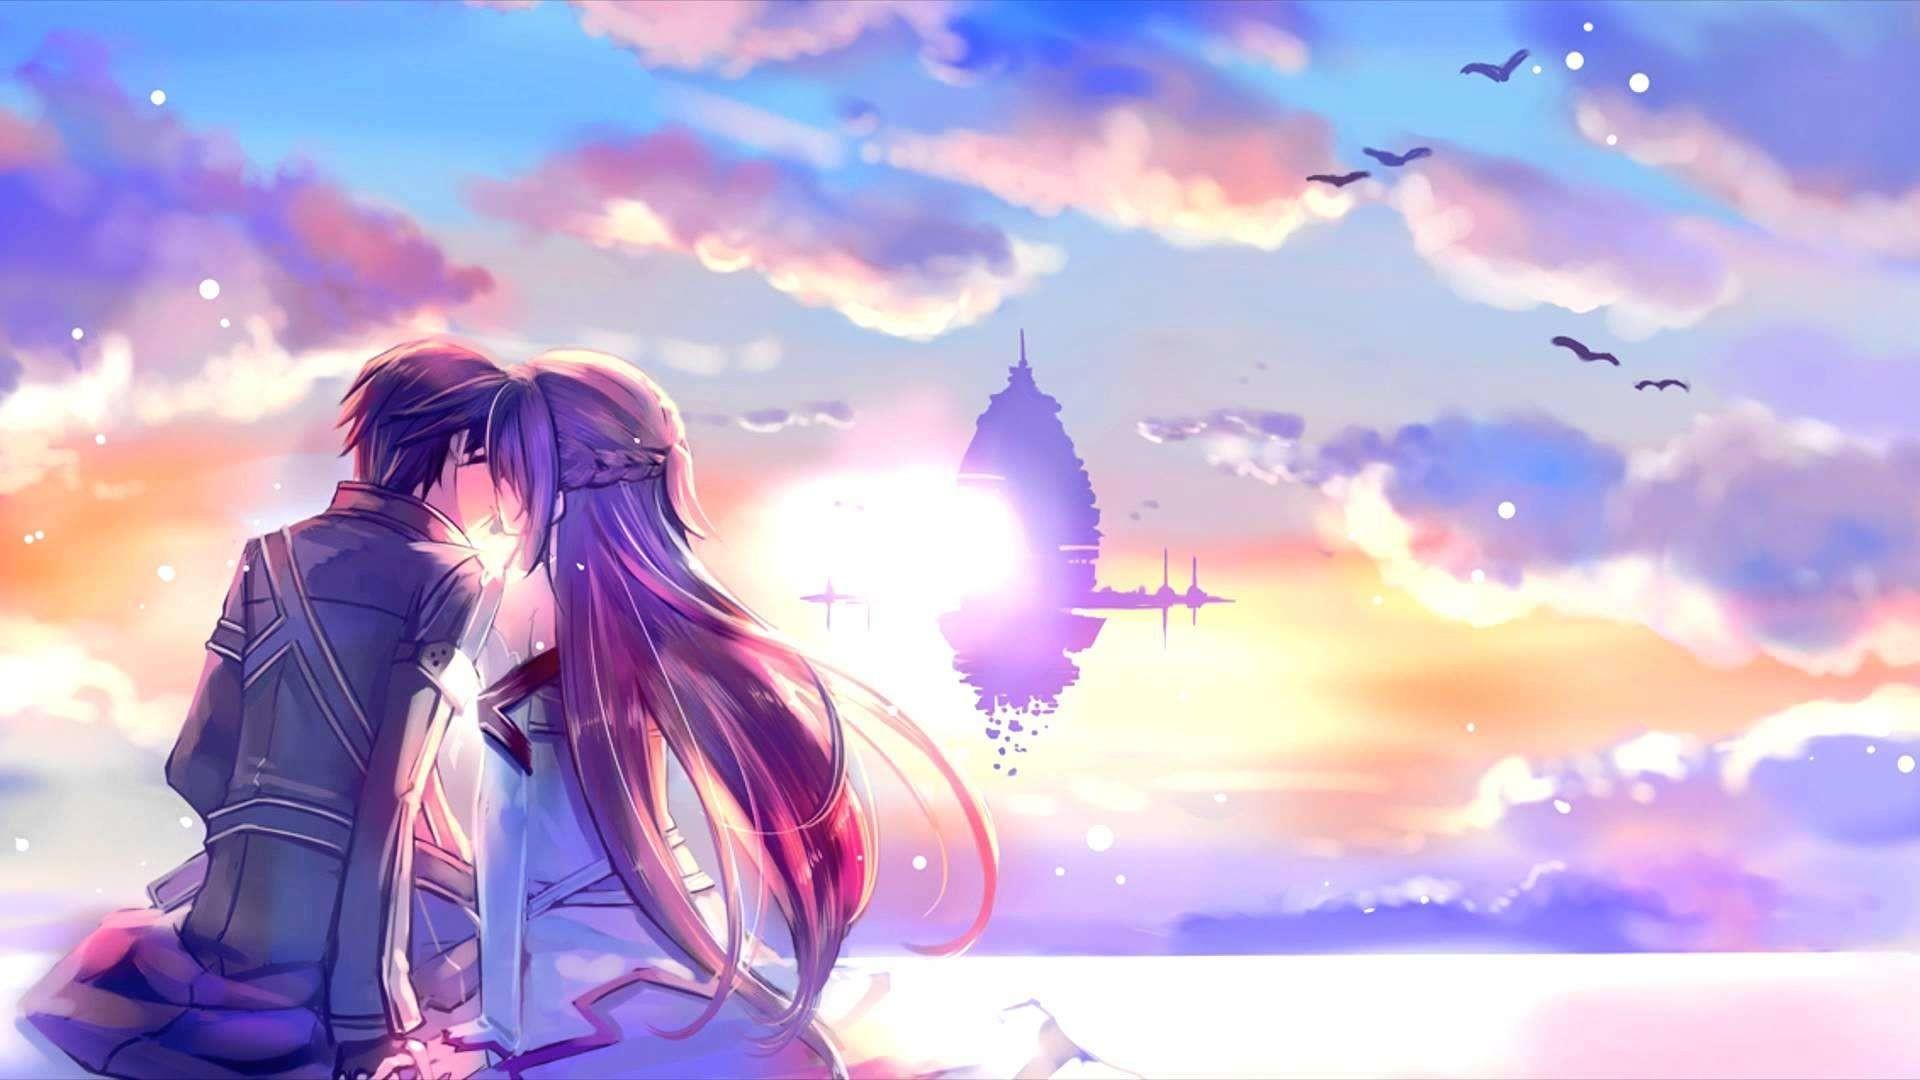 1920x1080, 1080p Anime Background Download Free - Love Wallpaper Anime - HD Wallpaper